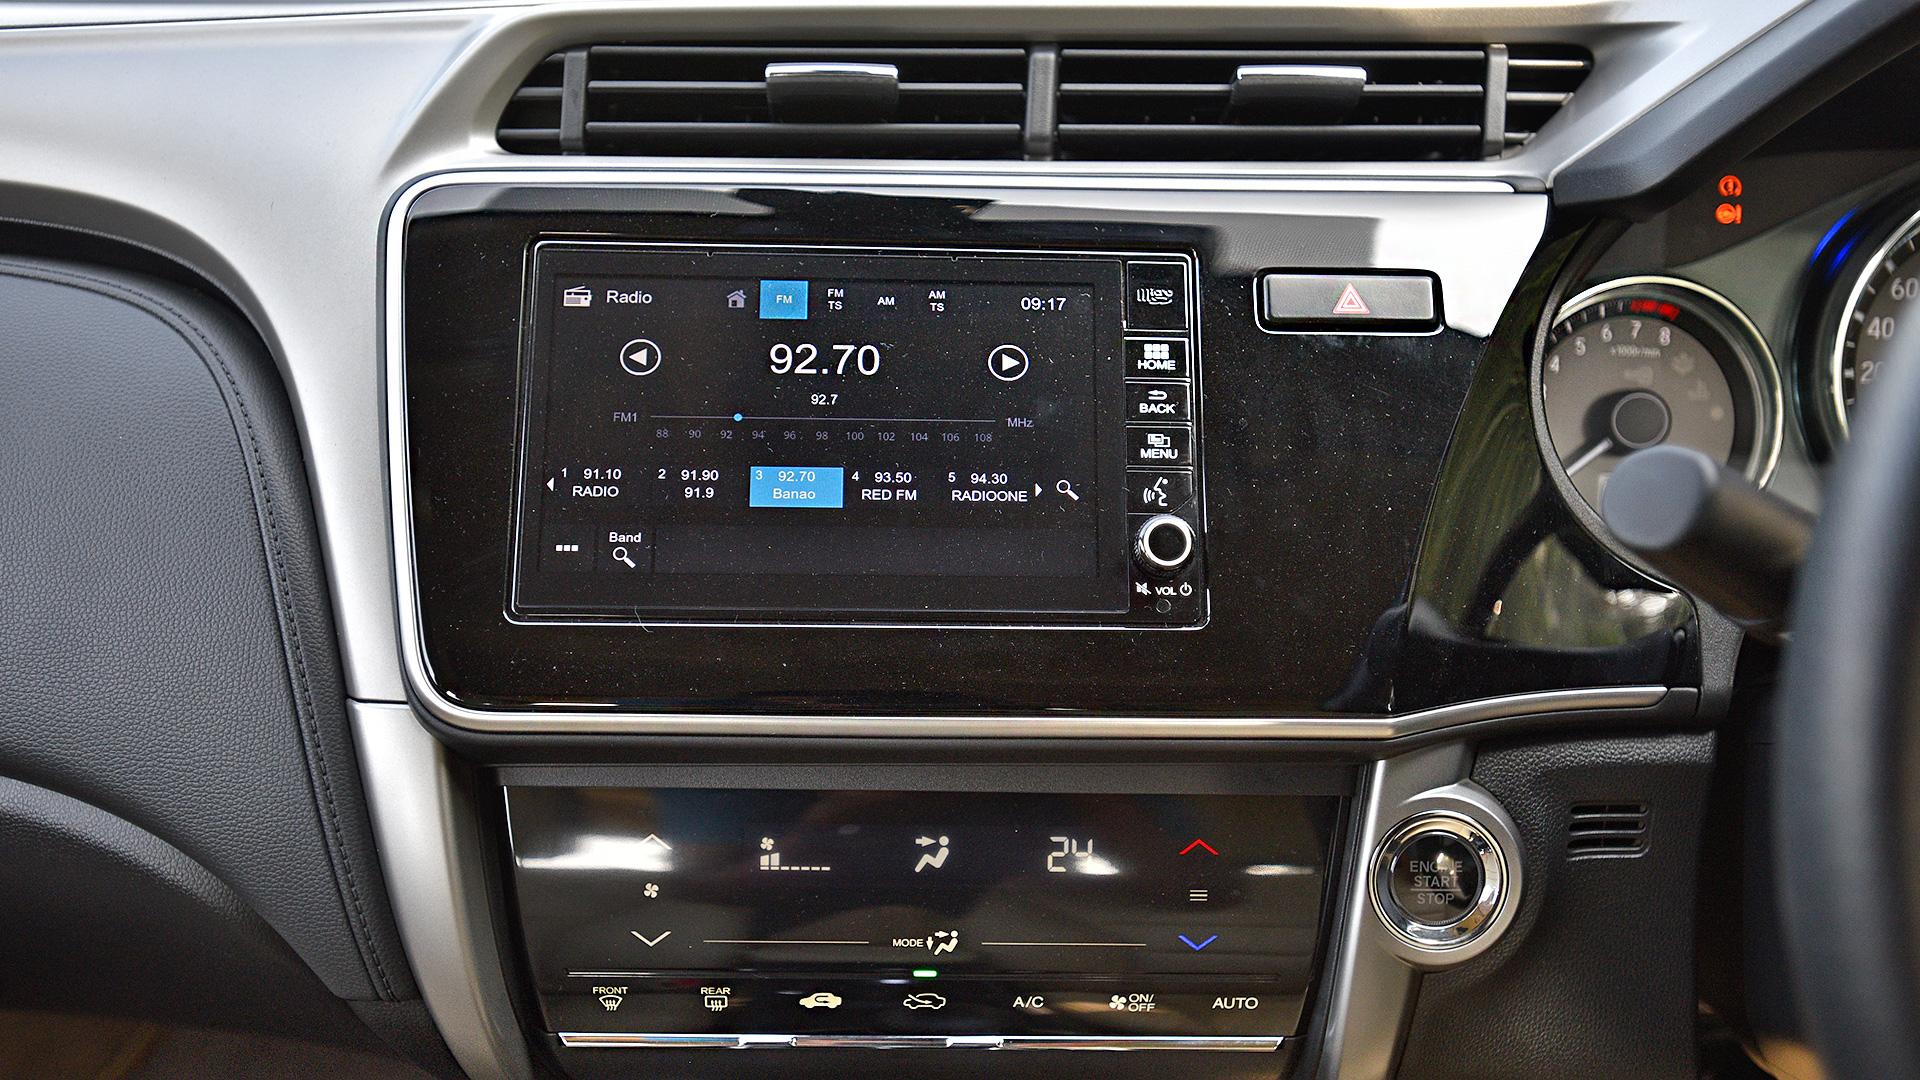 Honda City 2017 Petrol ZX CVT Interior Car Photos - Overdrive